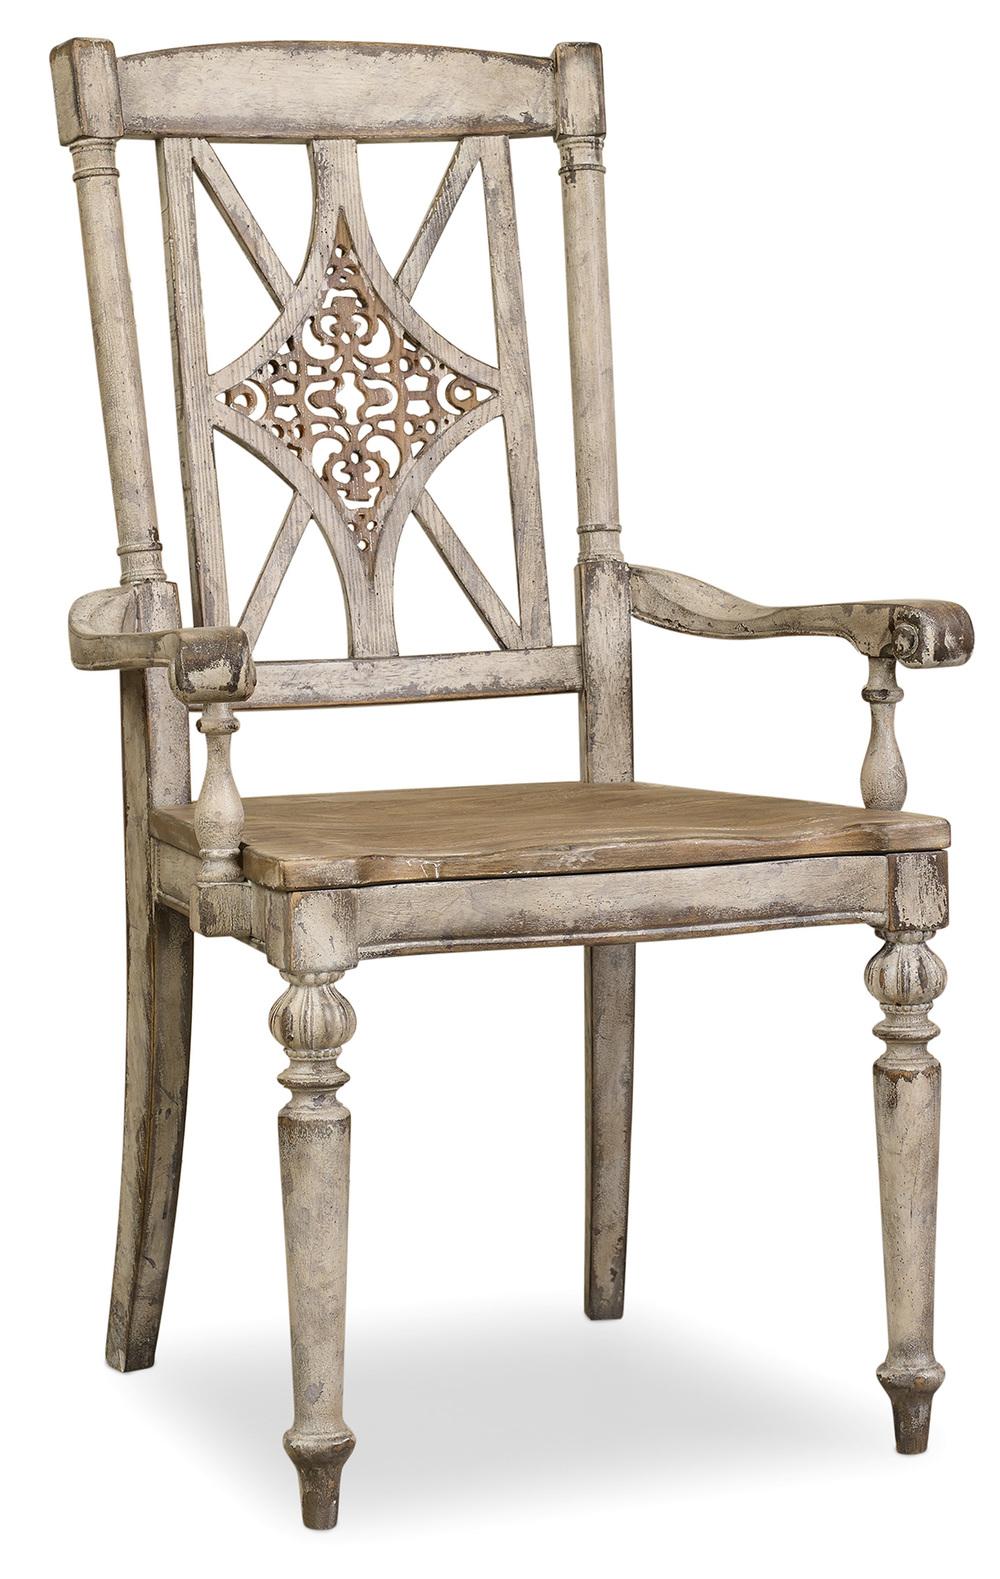 HOOKER FURNITURE CO - Fretback Arm Chair